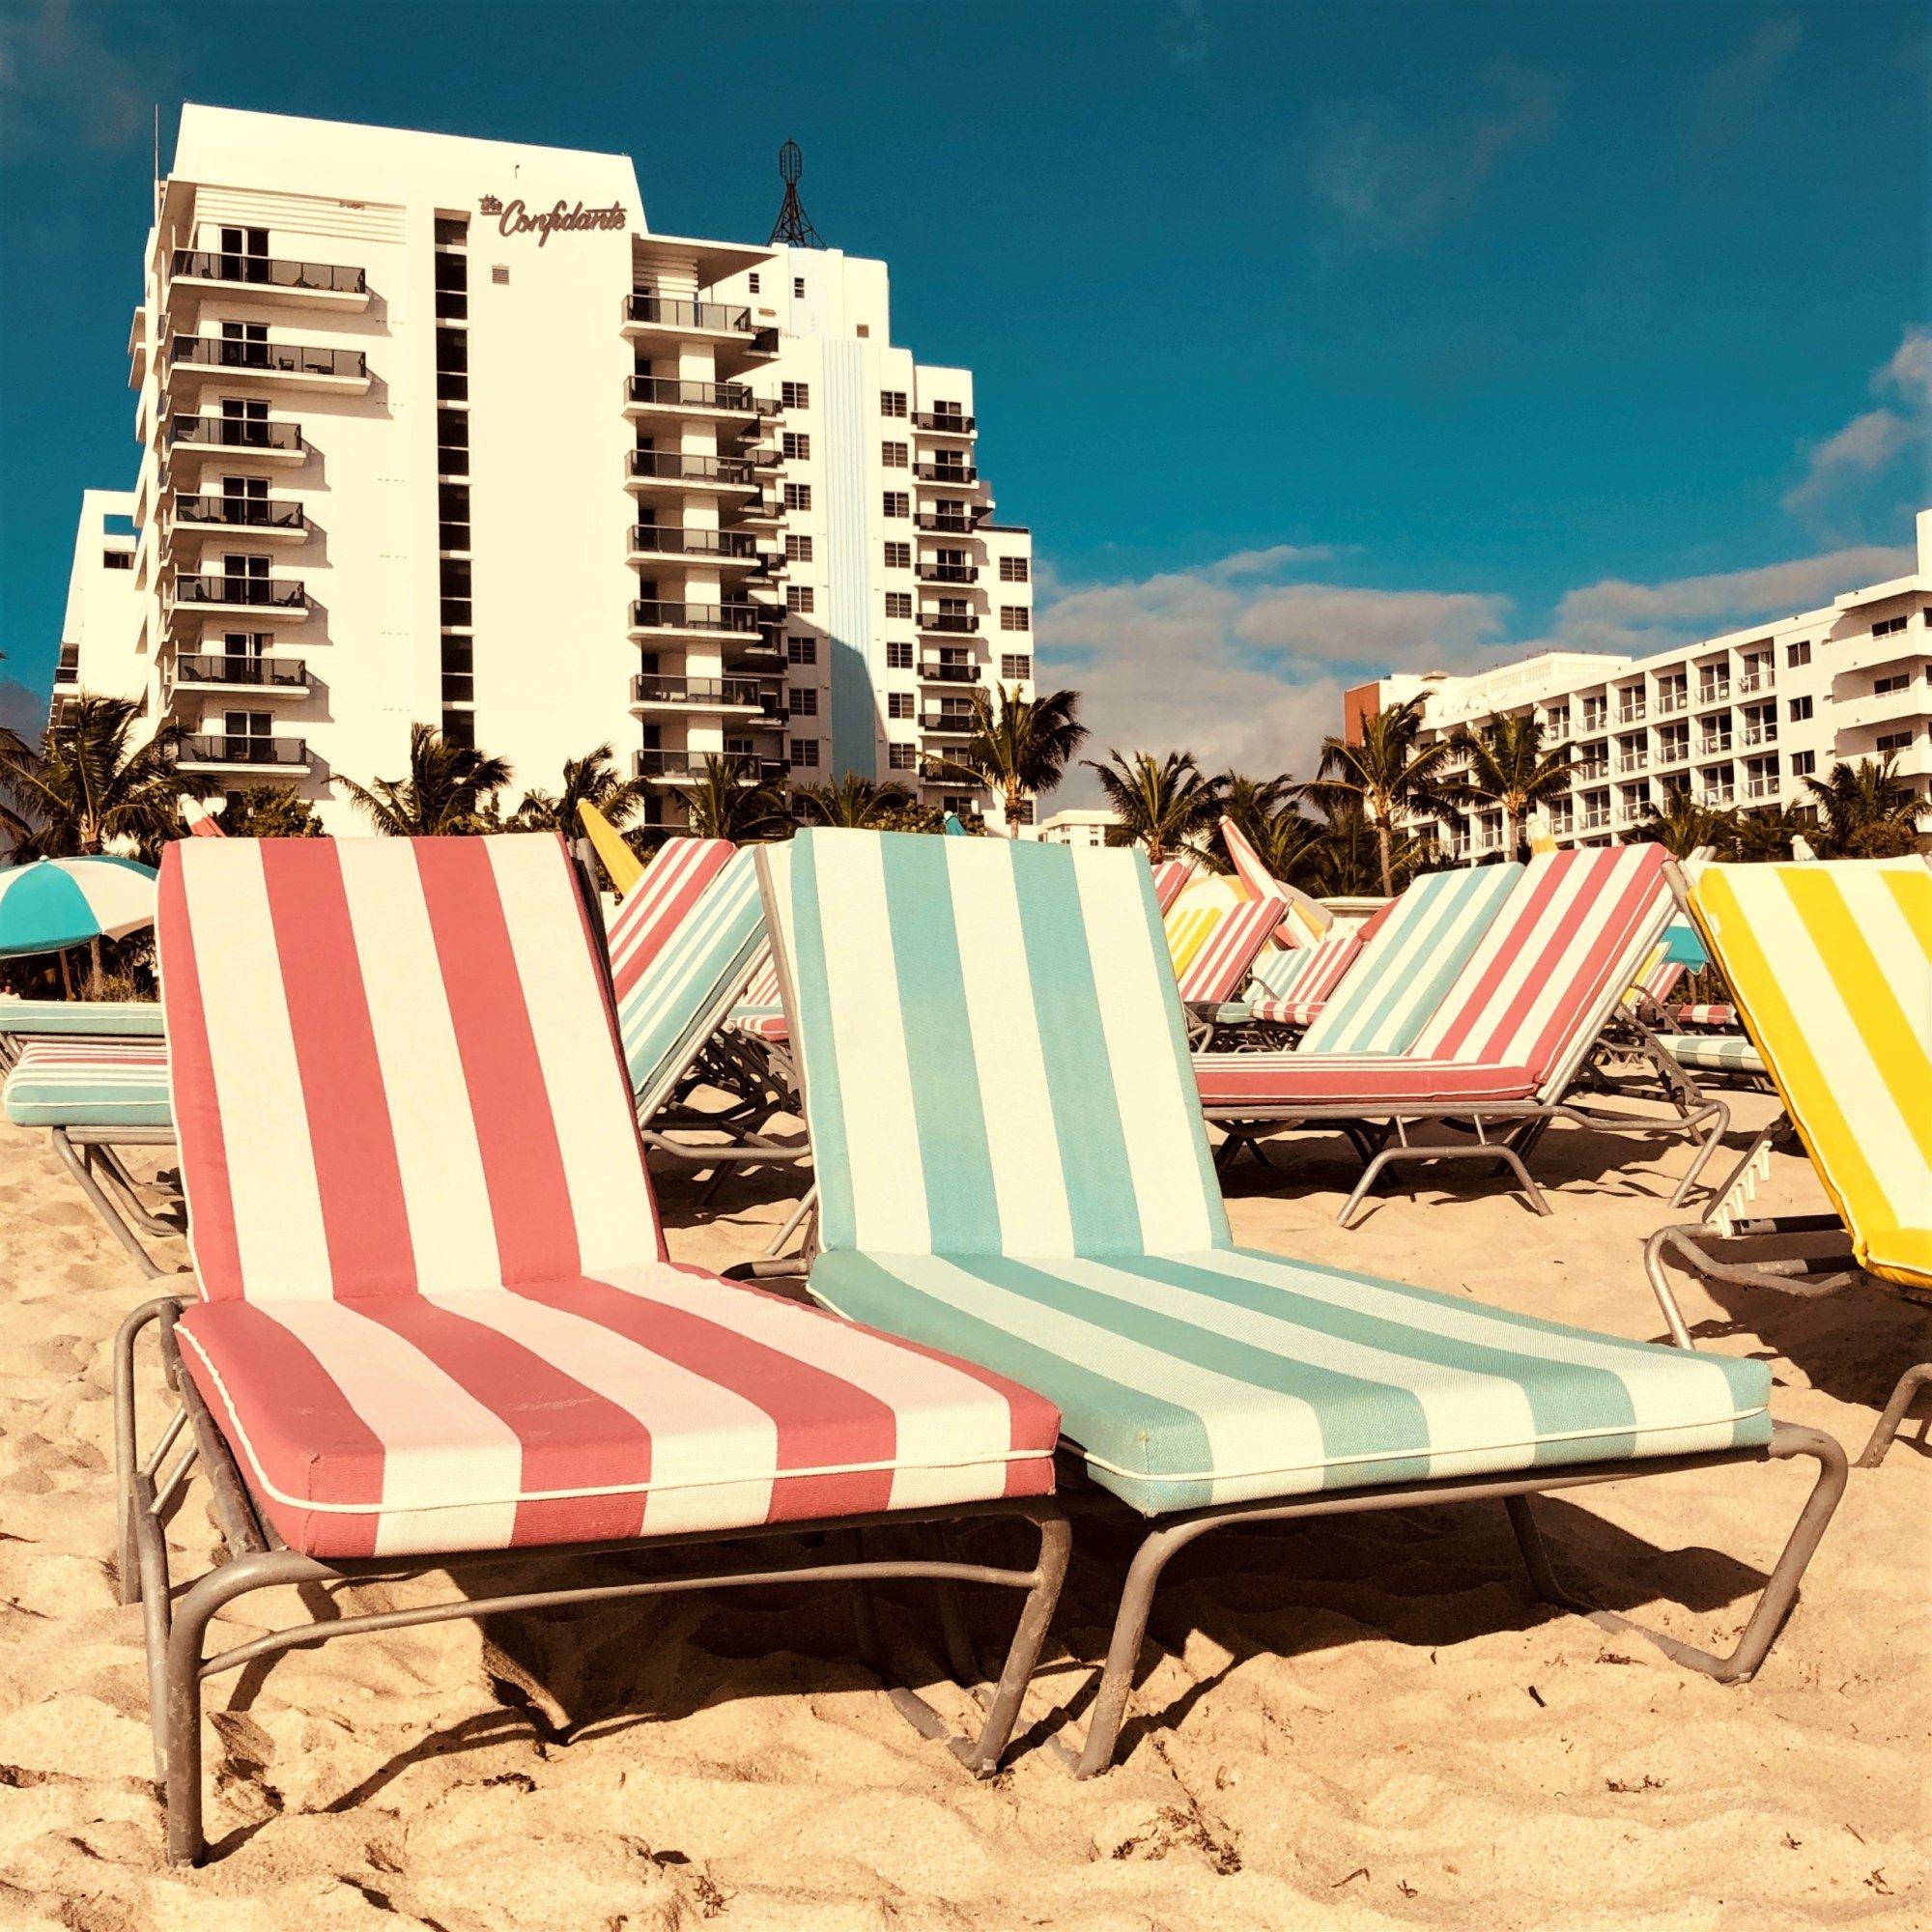 The Confidante Miami Beach Our New Year's Eve Stay